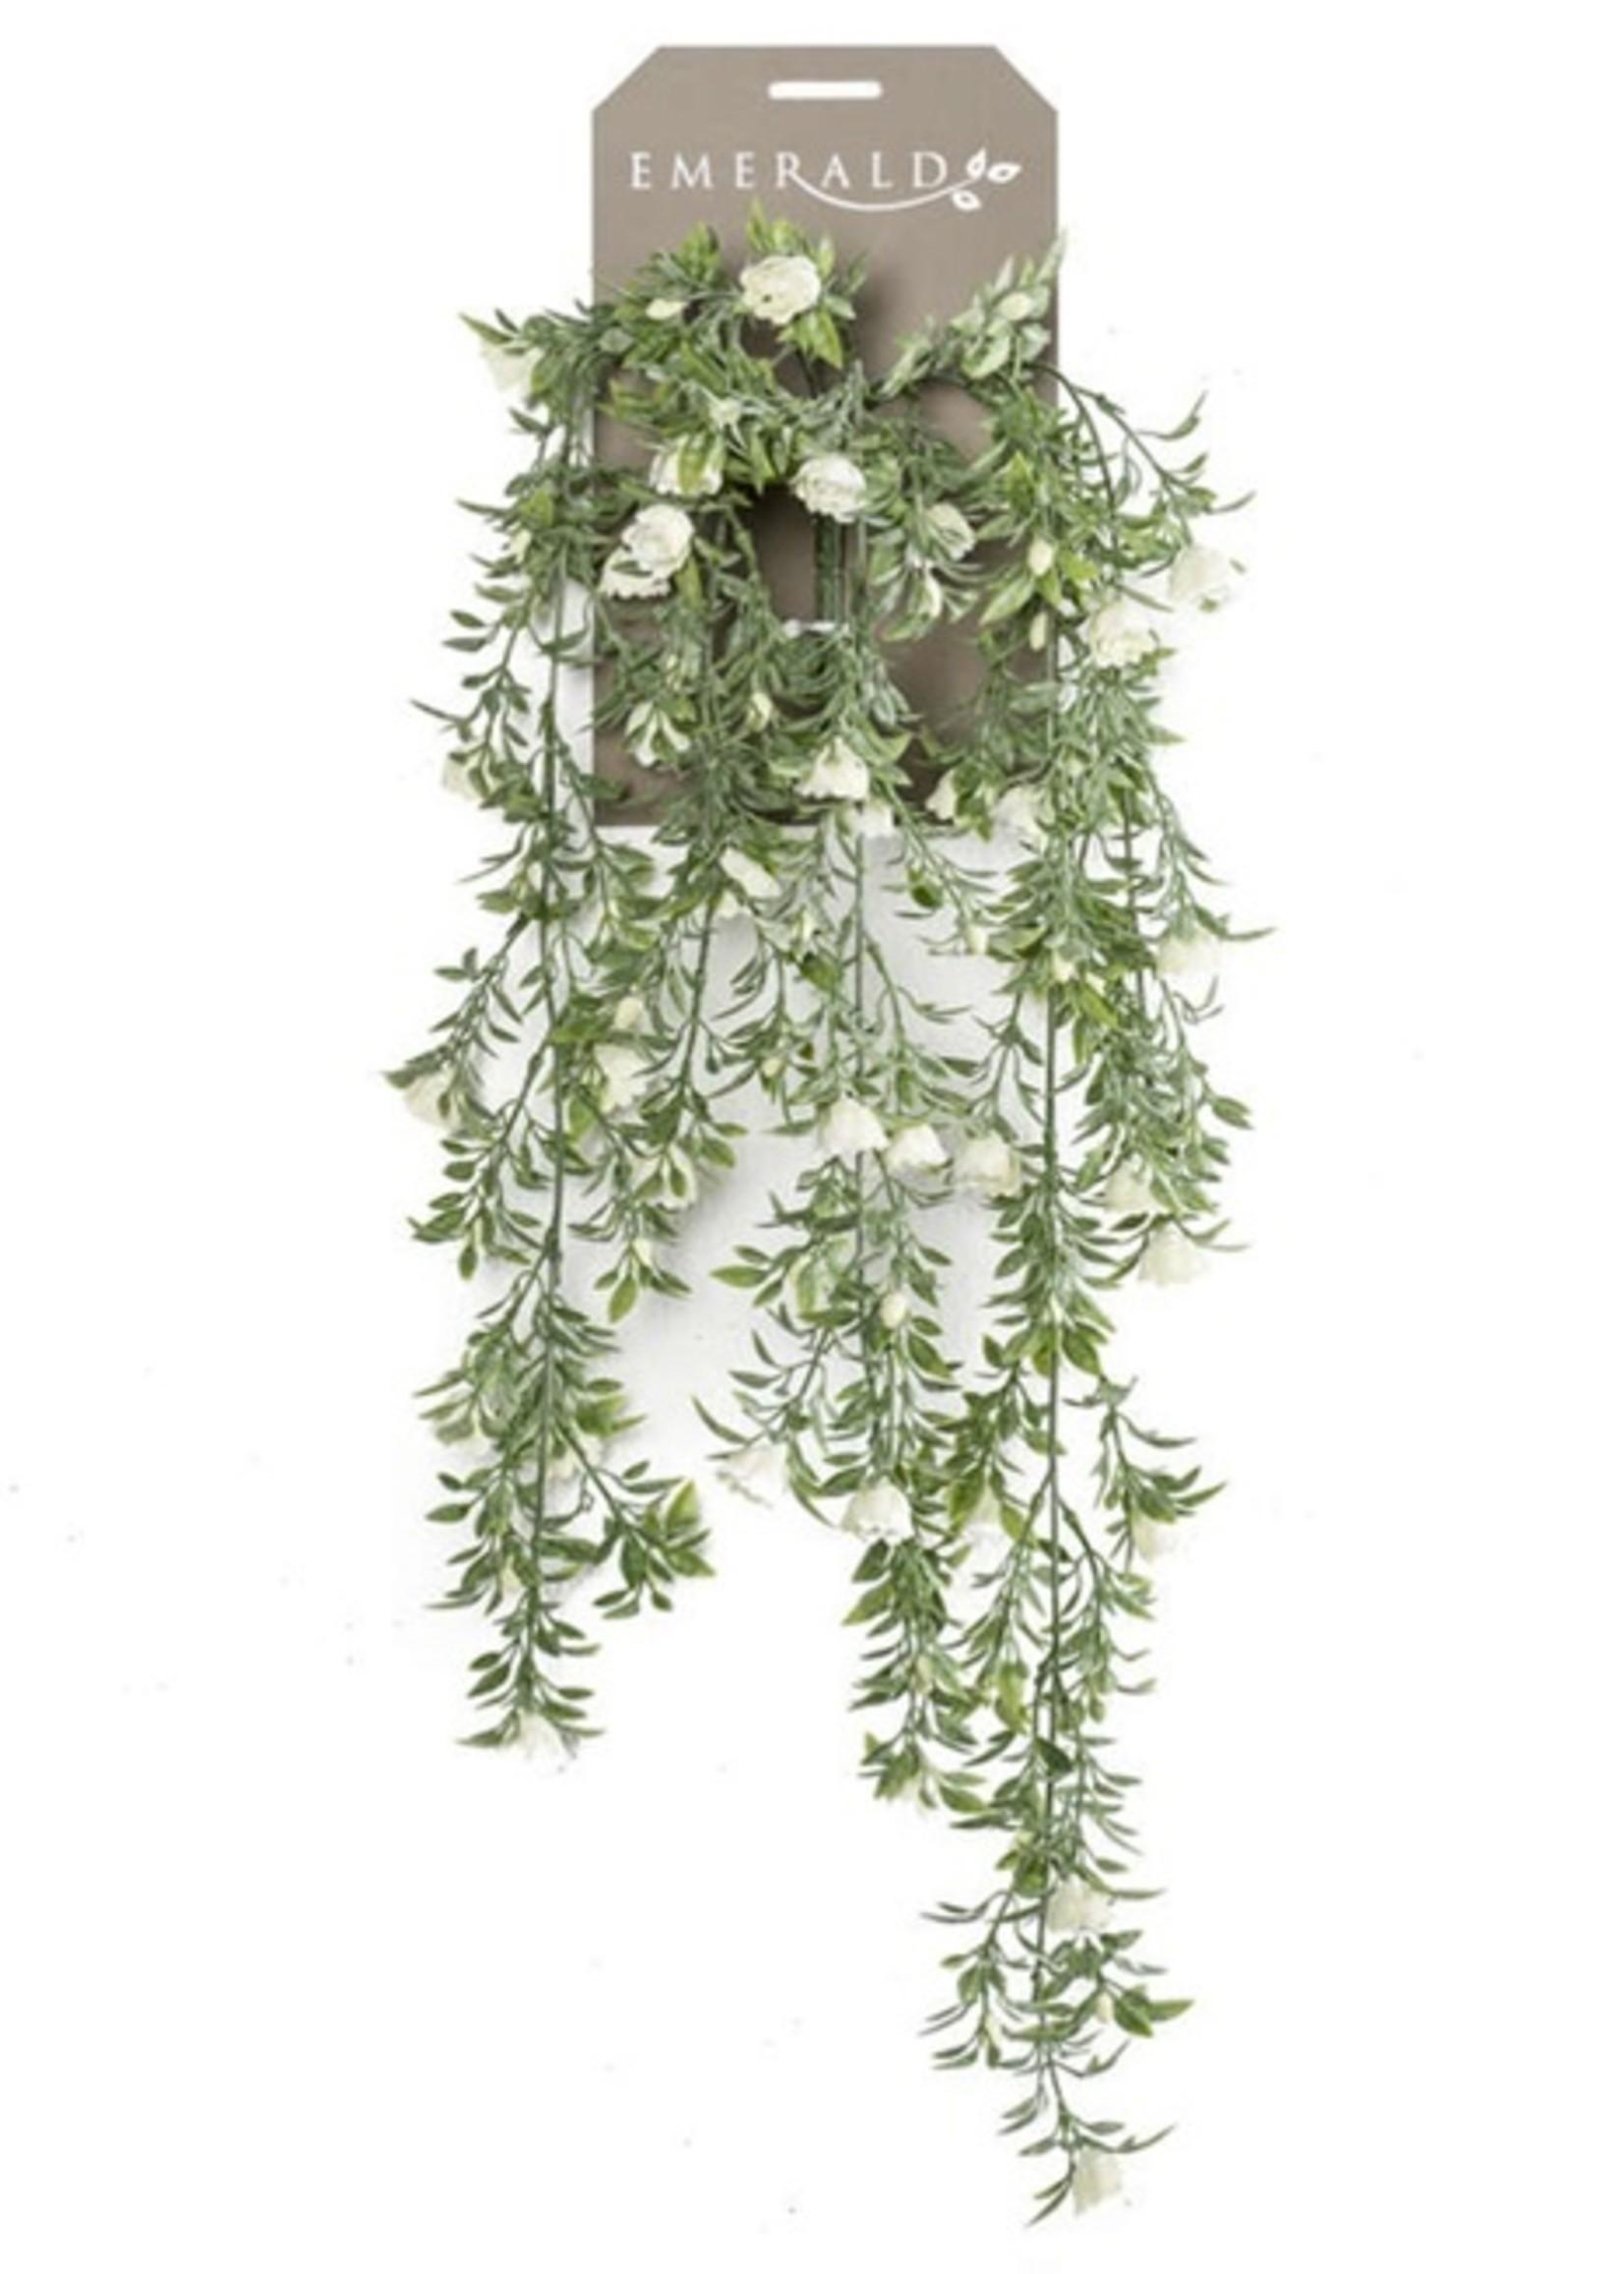 Emerald Eternal Green Rose mini hanging bush x5 75cm cream